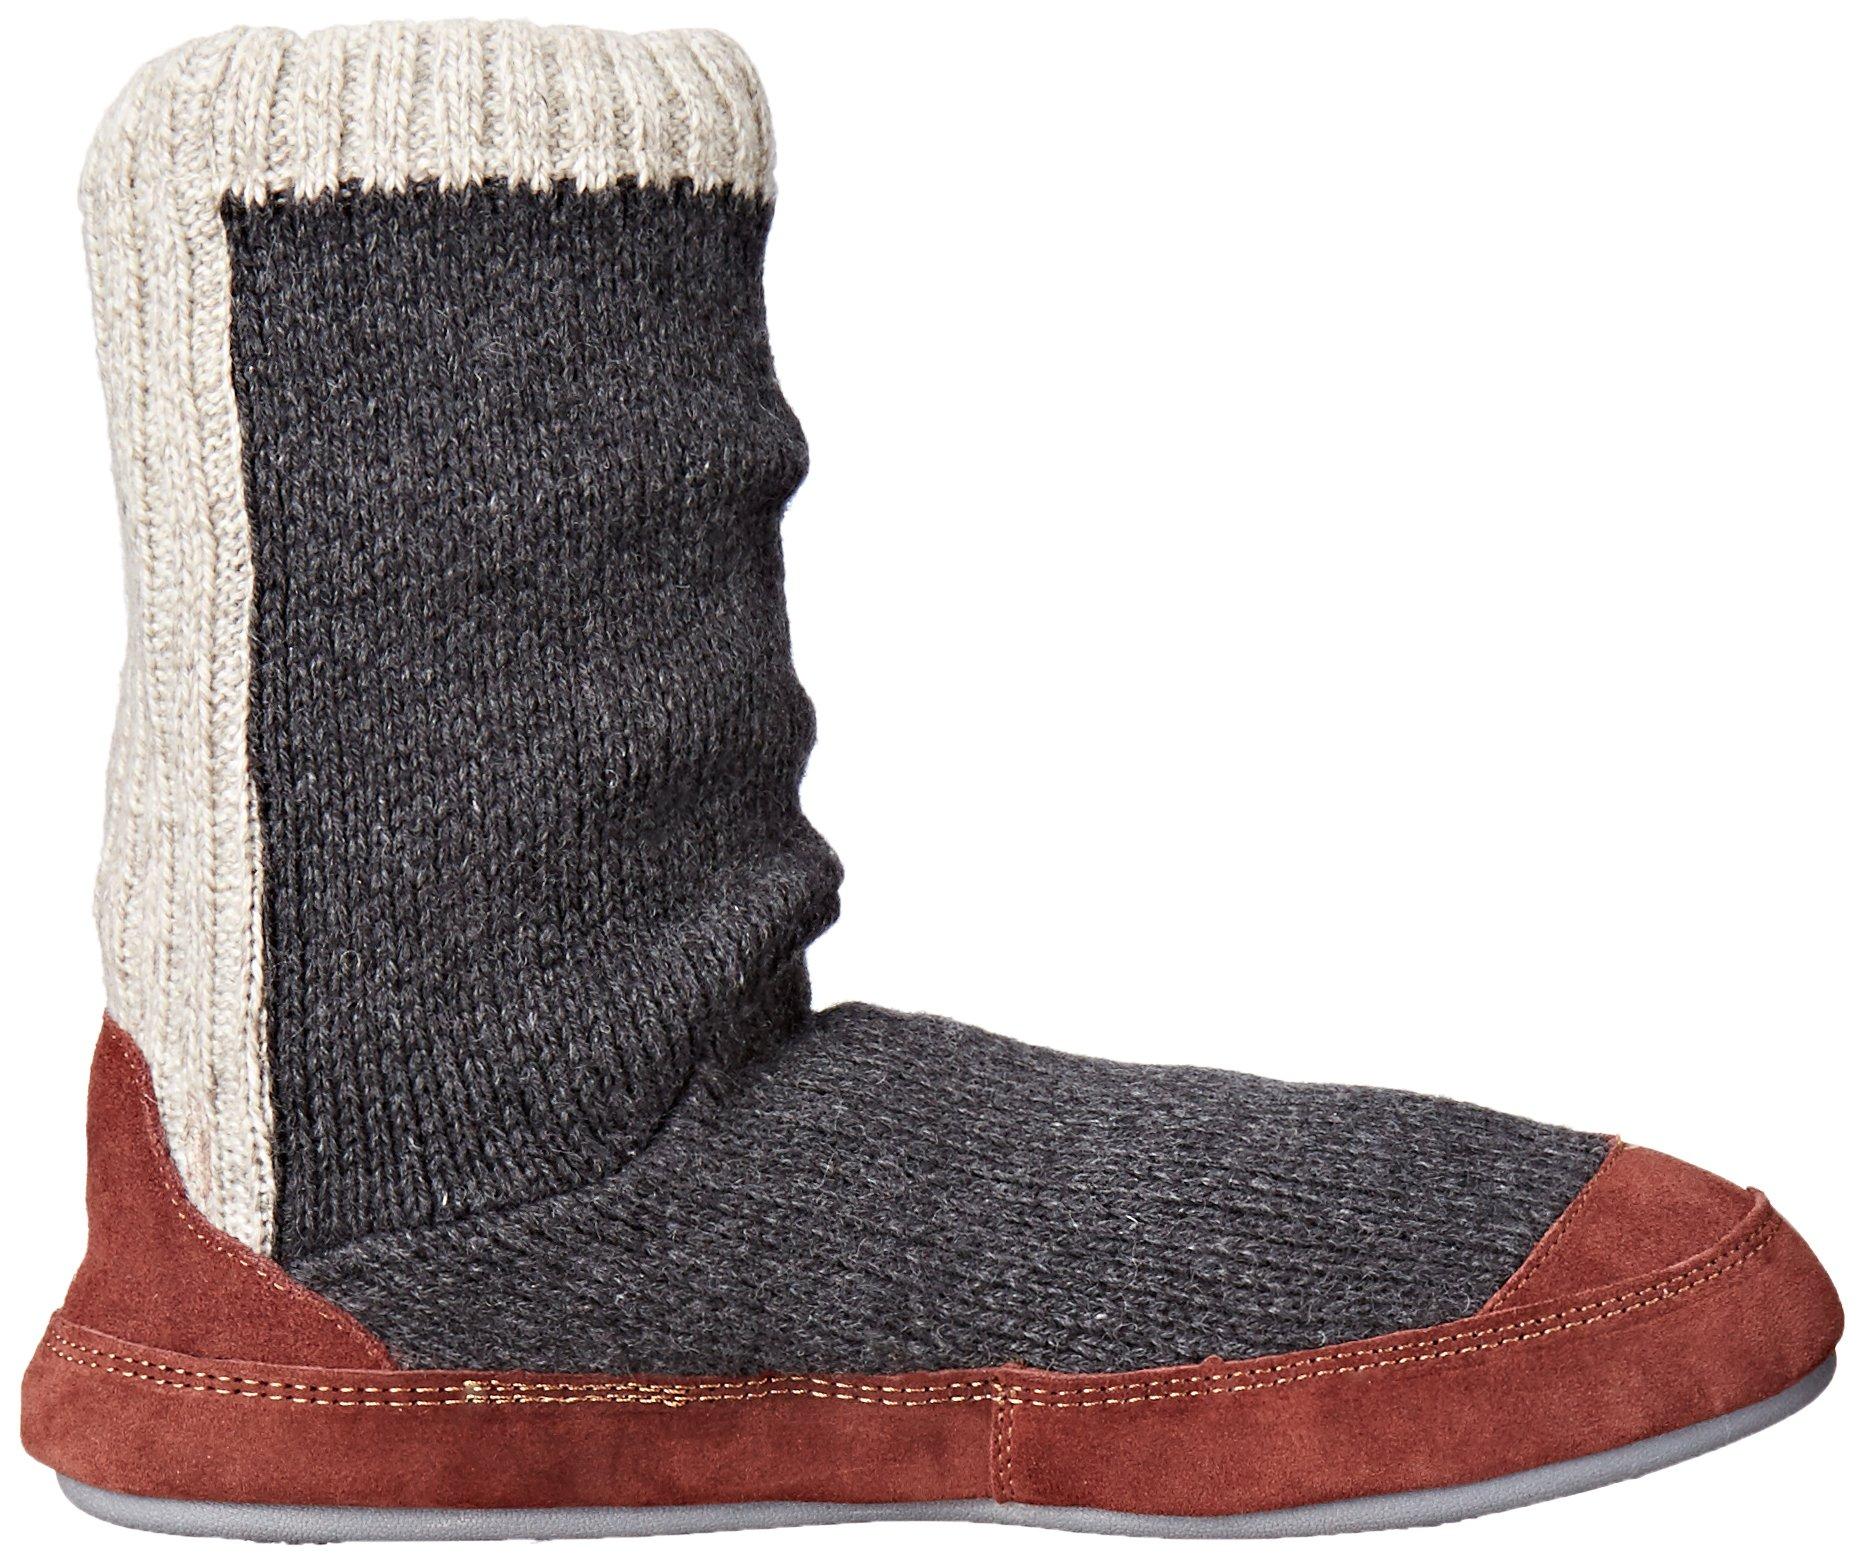 Acorn Men's Slouch Boot Slipper, Charcoal Ragg Wool, Medium/9-10 B US by Acorn (Image #7)